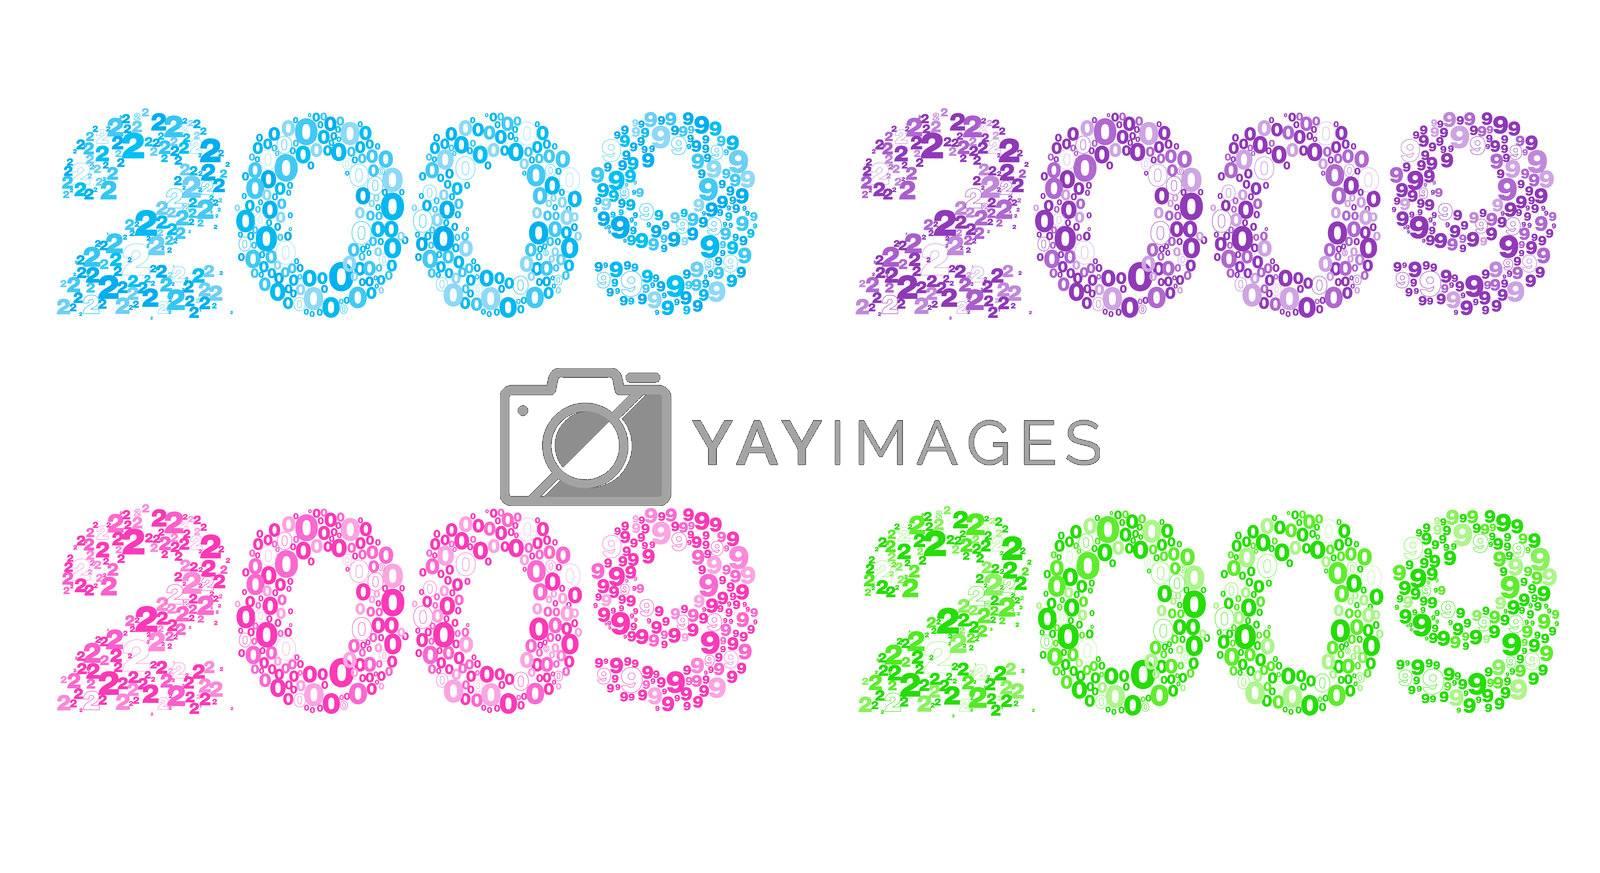 Happy New Year 2009 by khwi